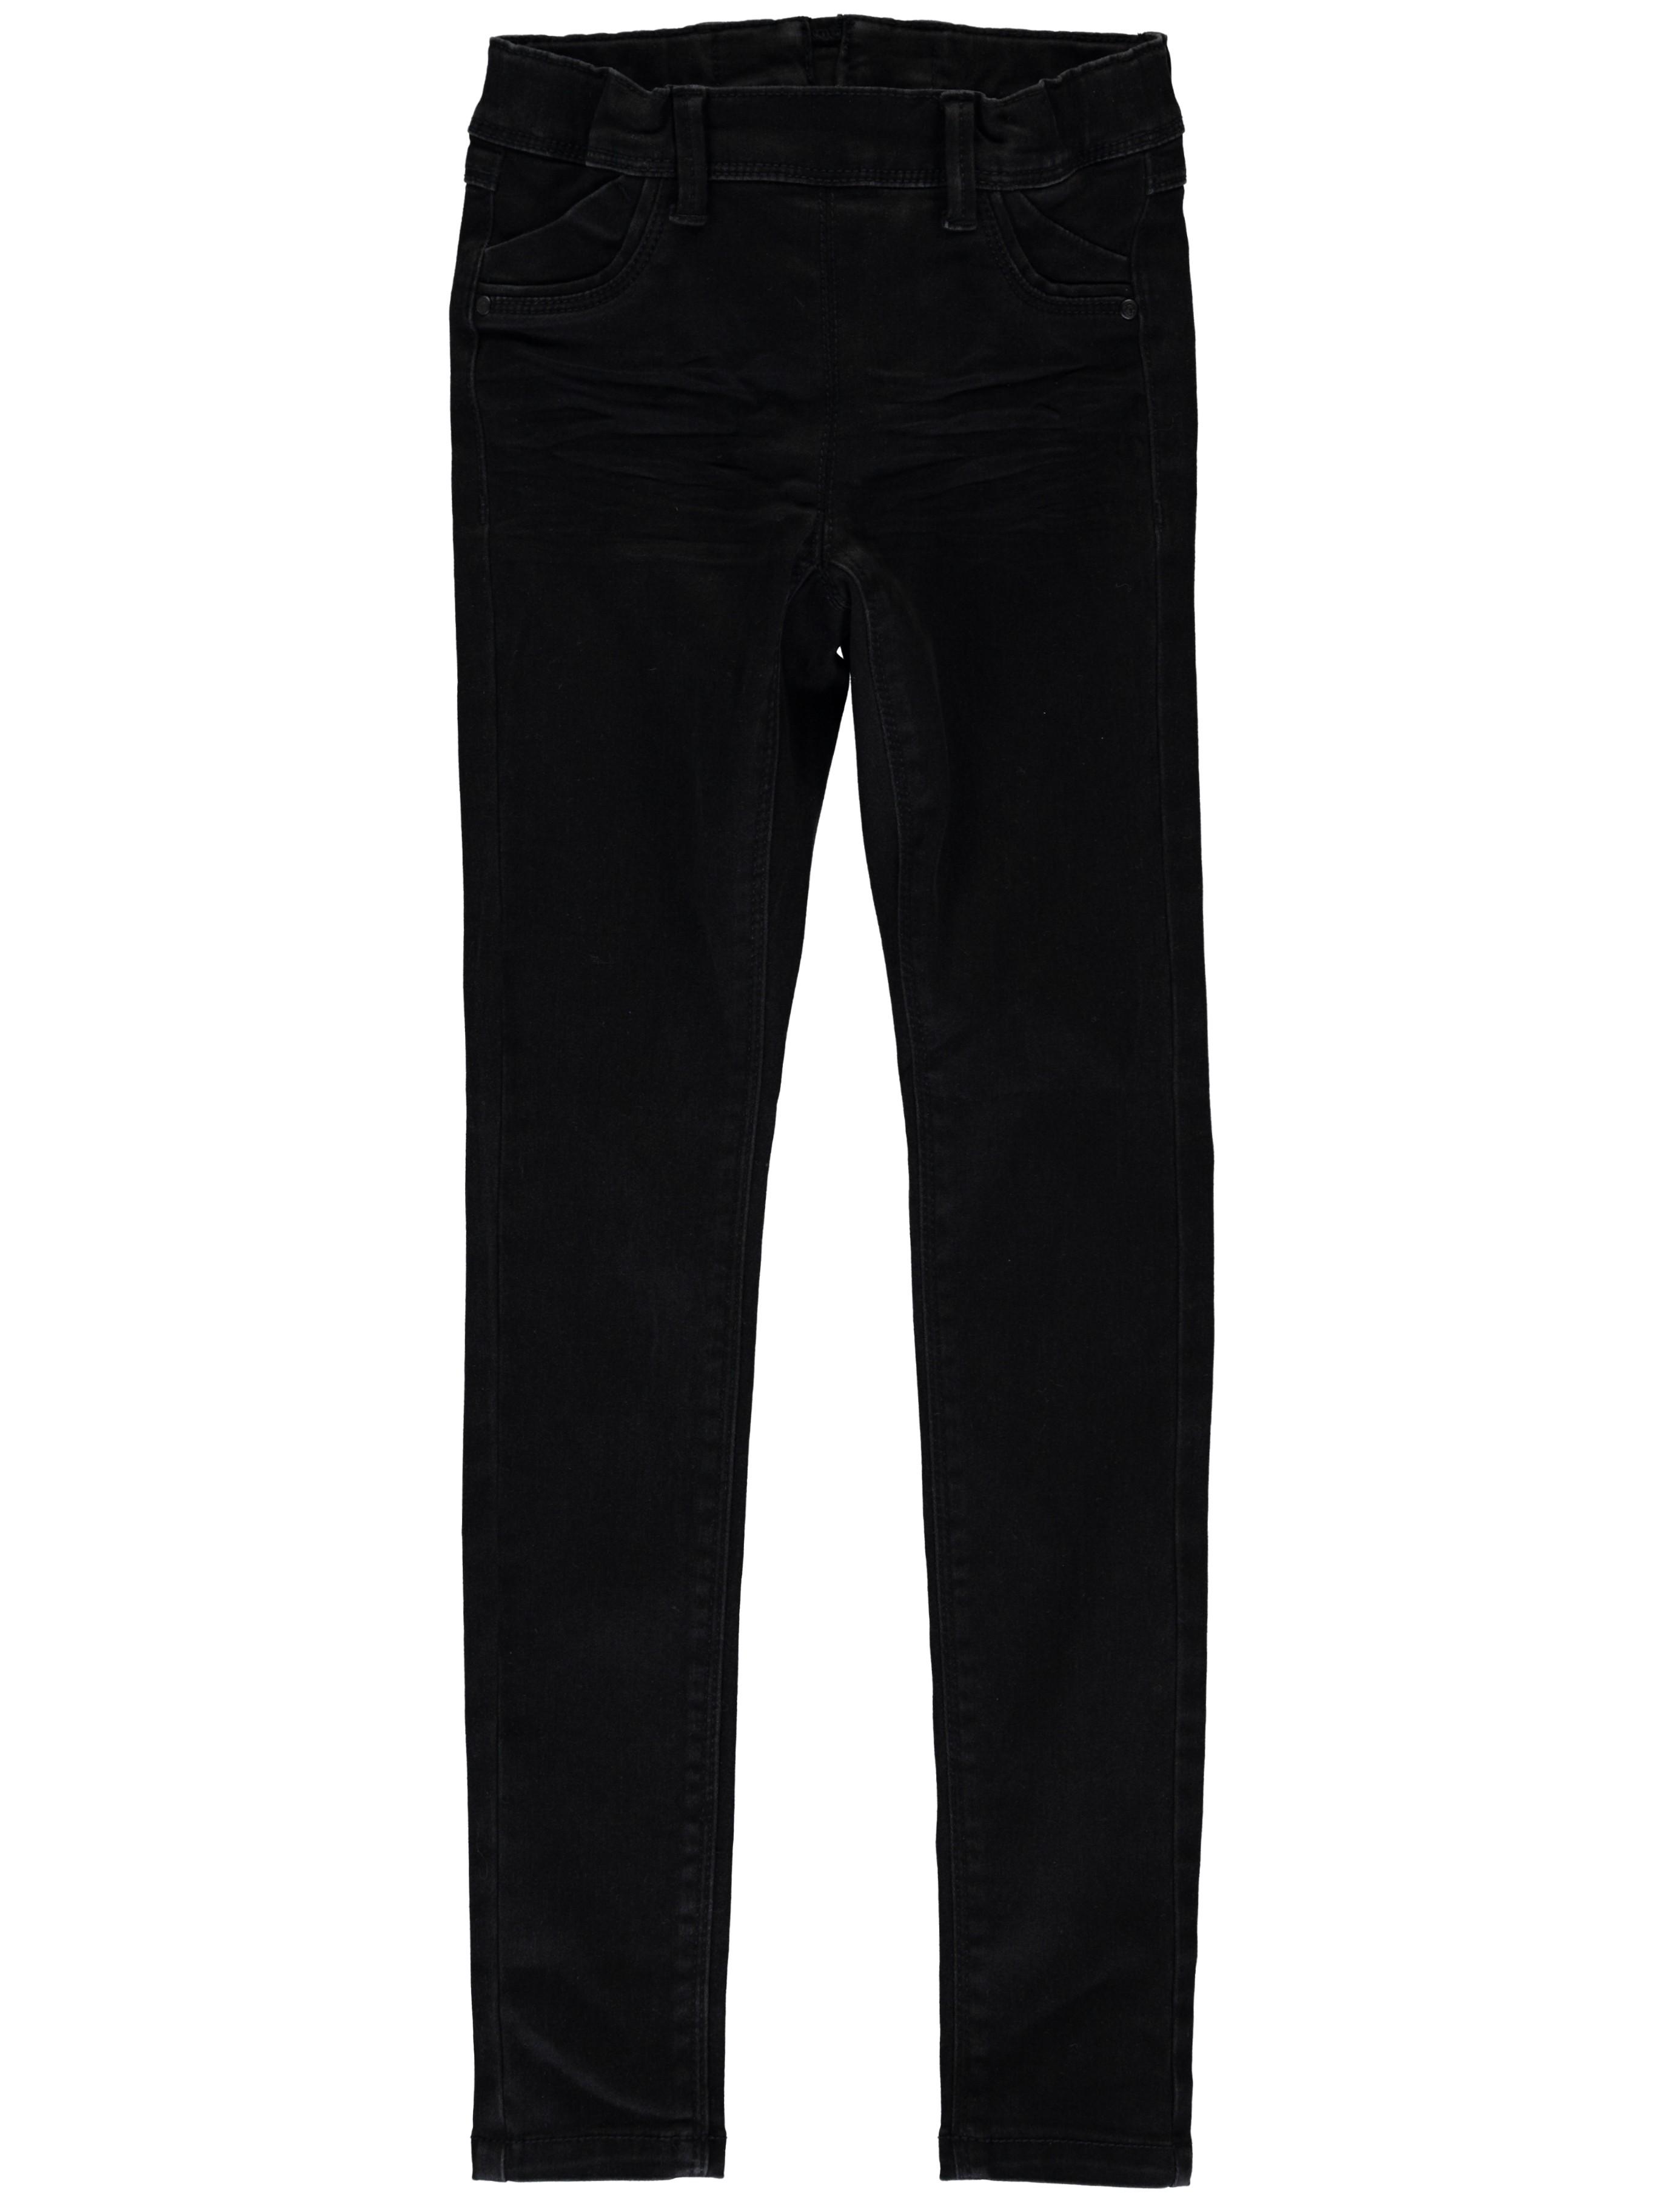 Werksverkauf modische Muster billiger NAME IT Kinder Mädchen Jeans Hose nitTENNE SKINNY DNM PANT NOOS Black Denim